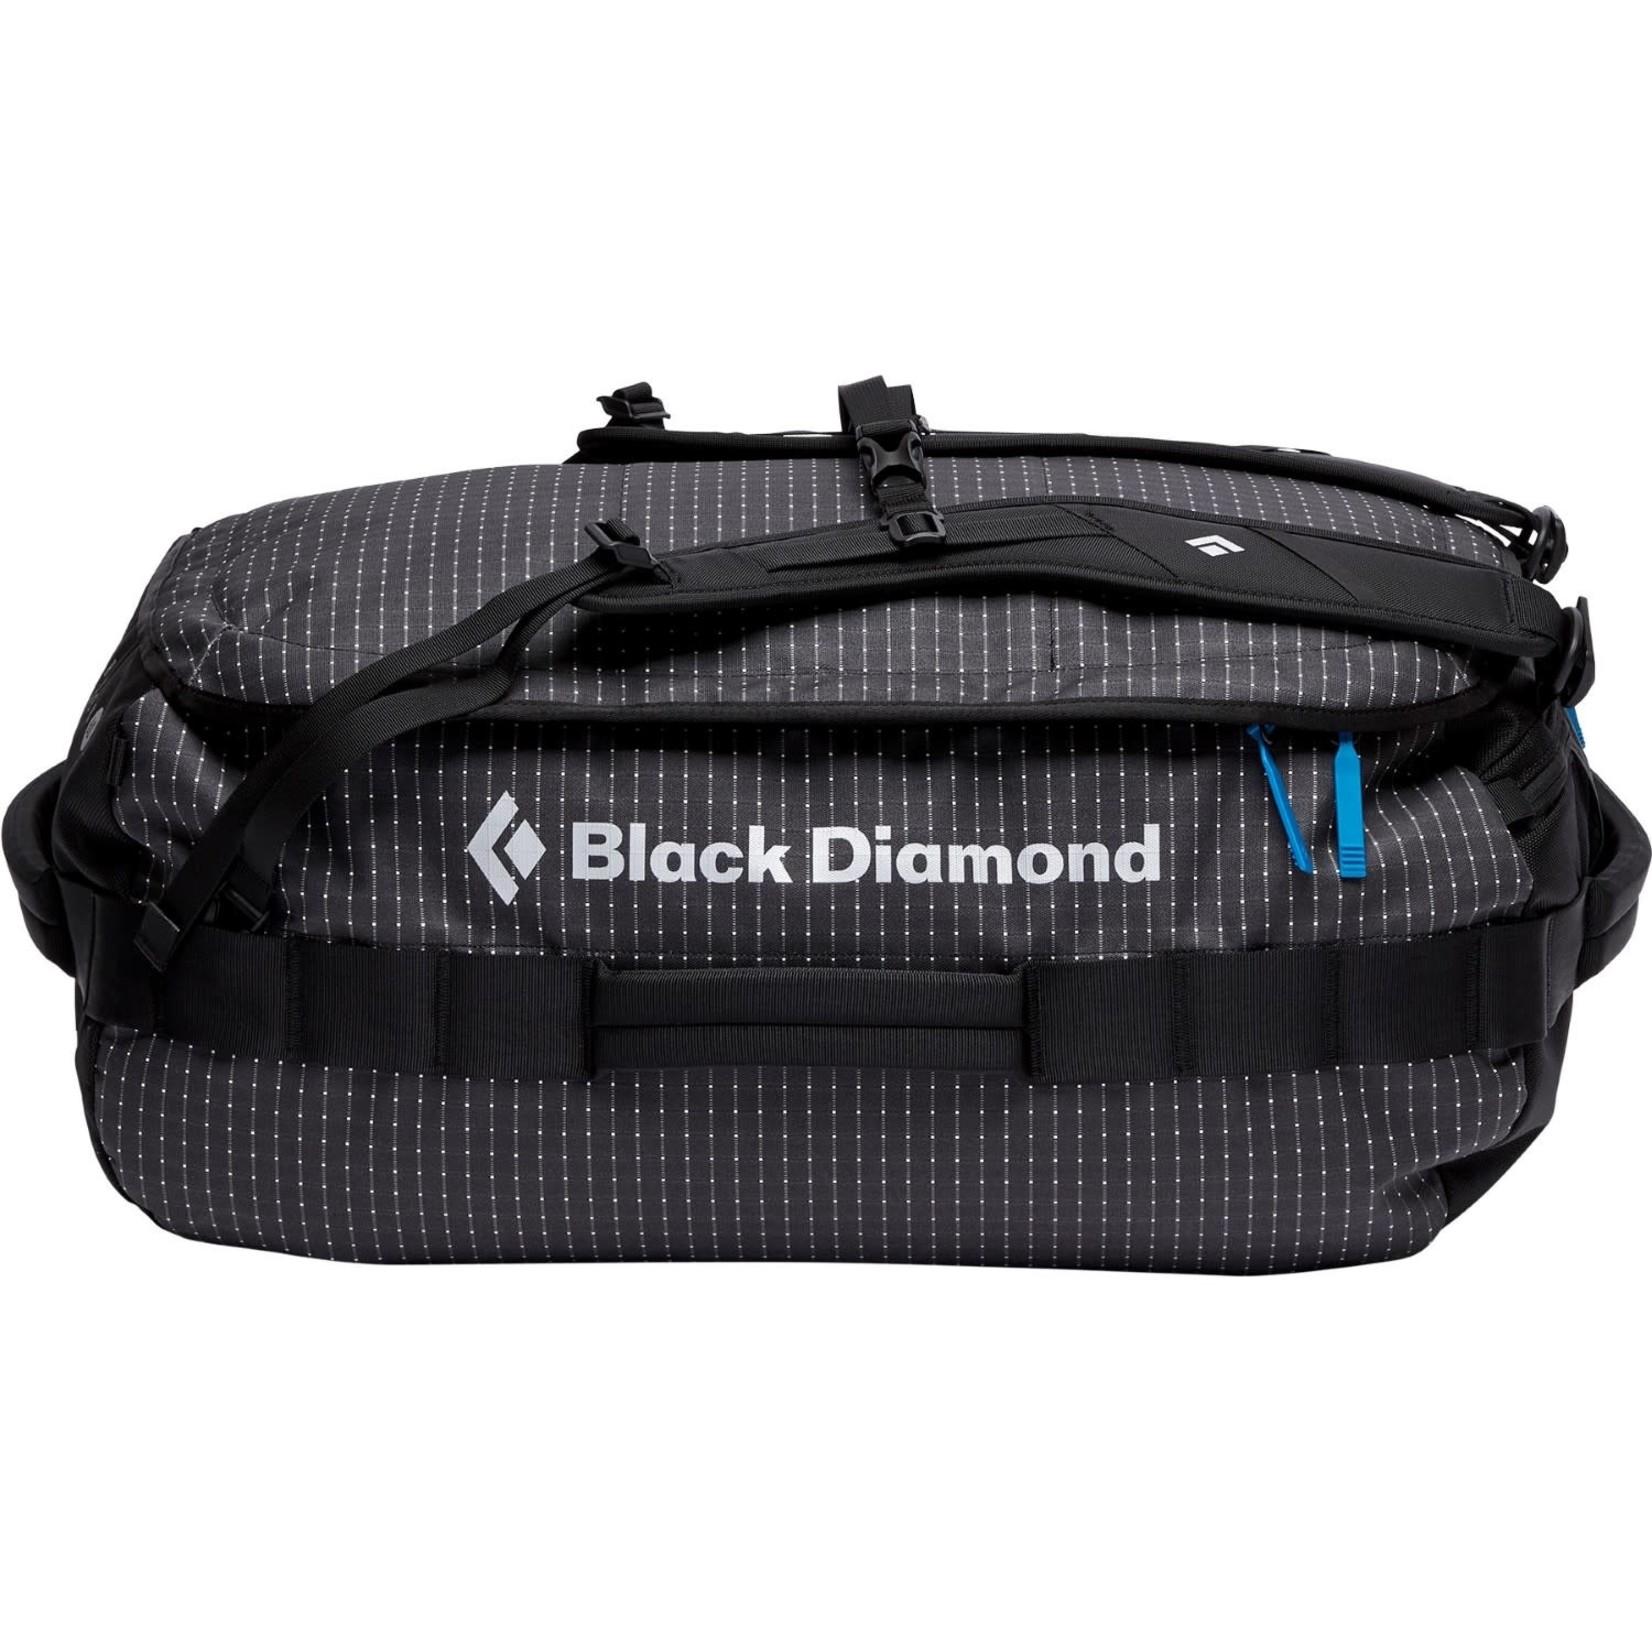 Black Diamond Sac fourre-tout Black Diamond Stonehauler 60L